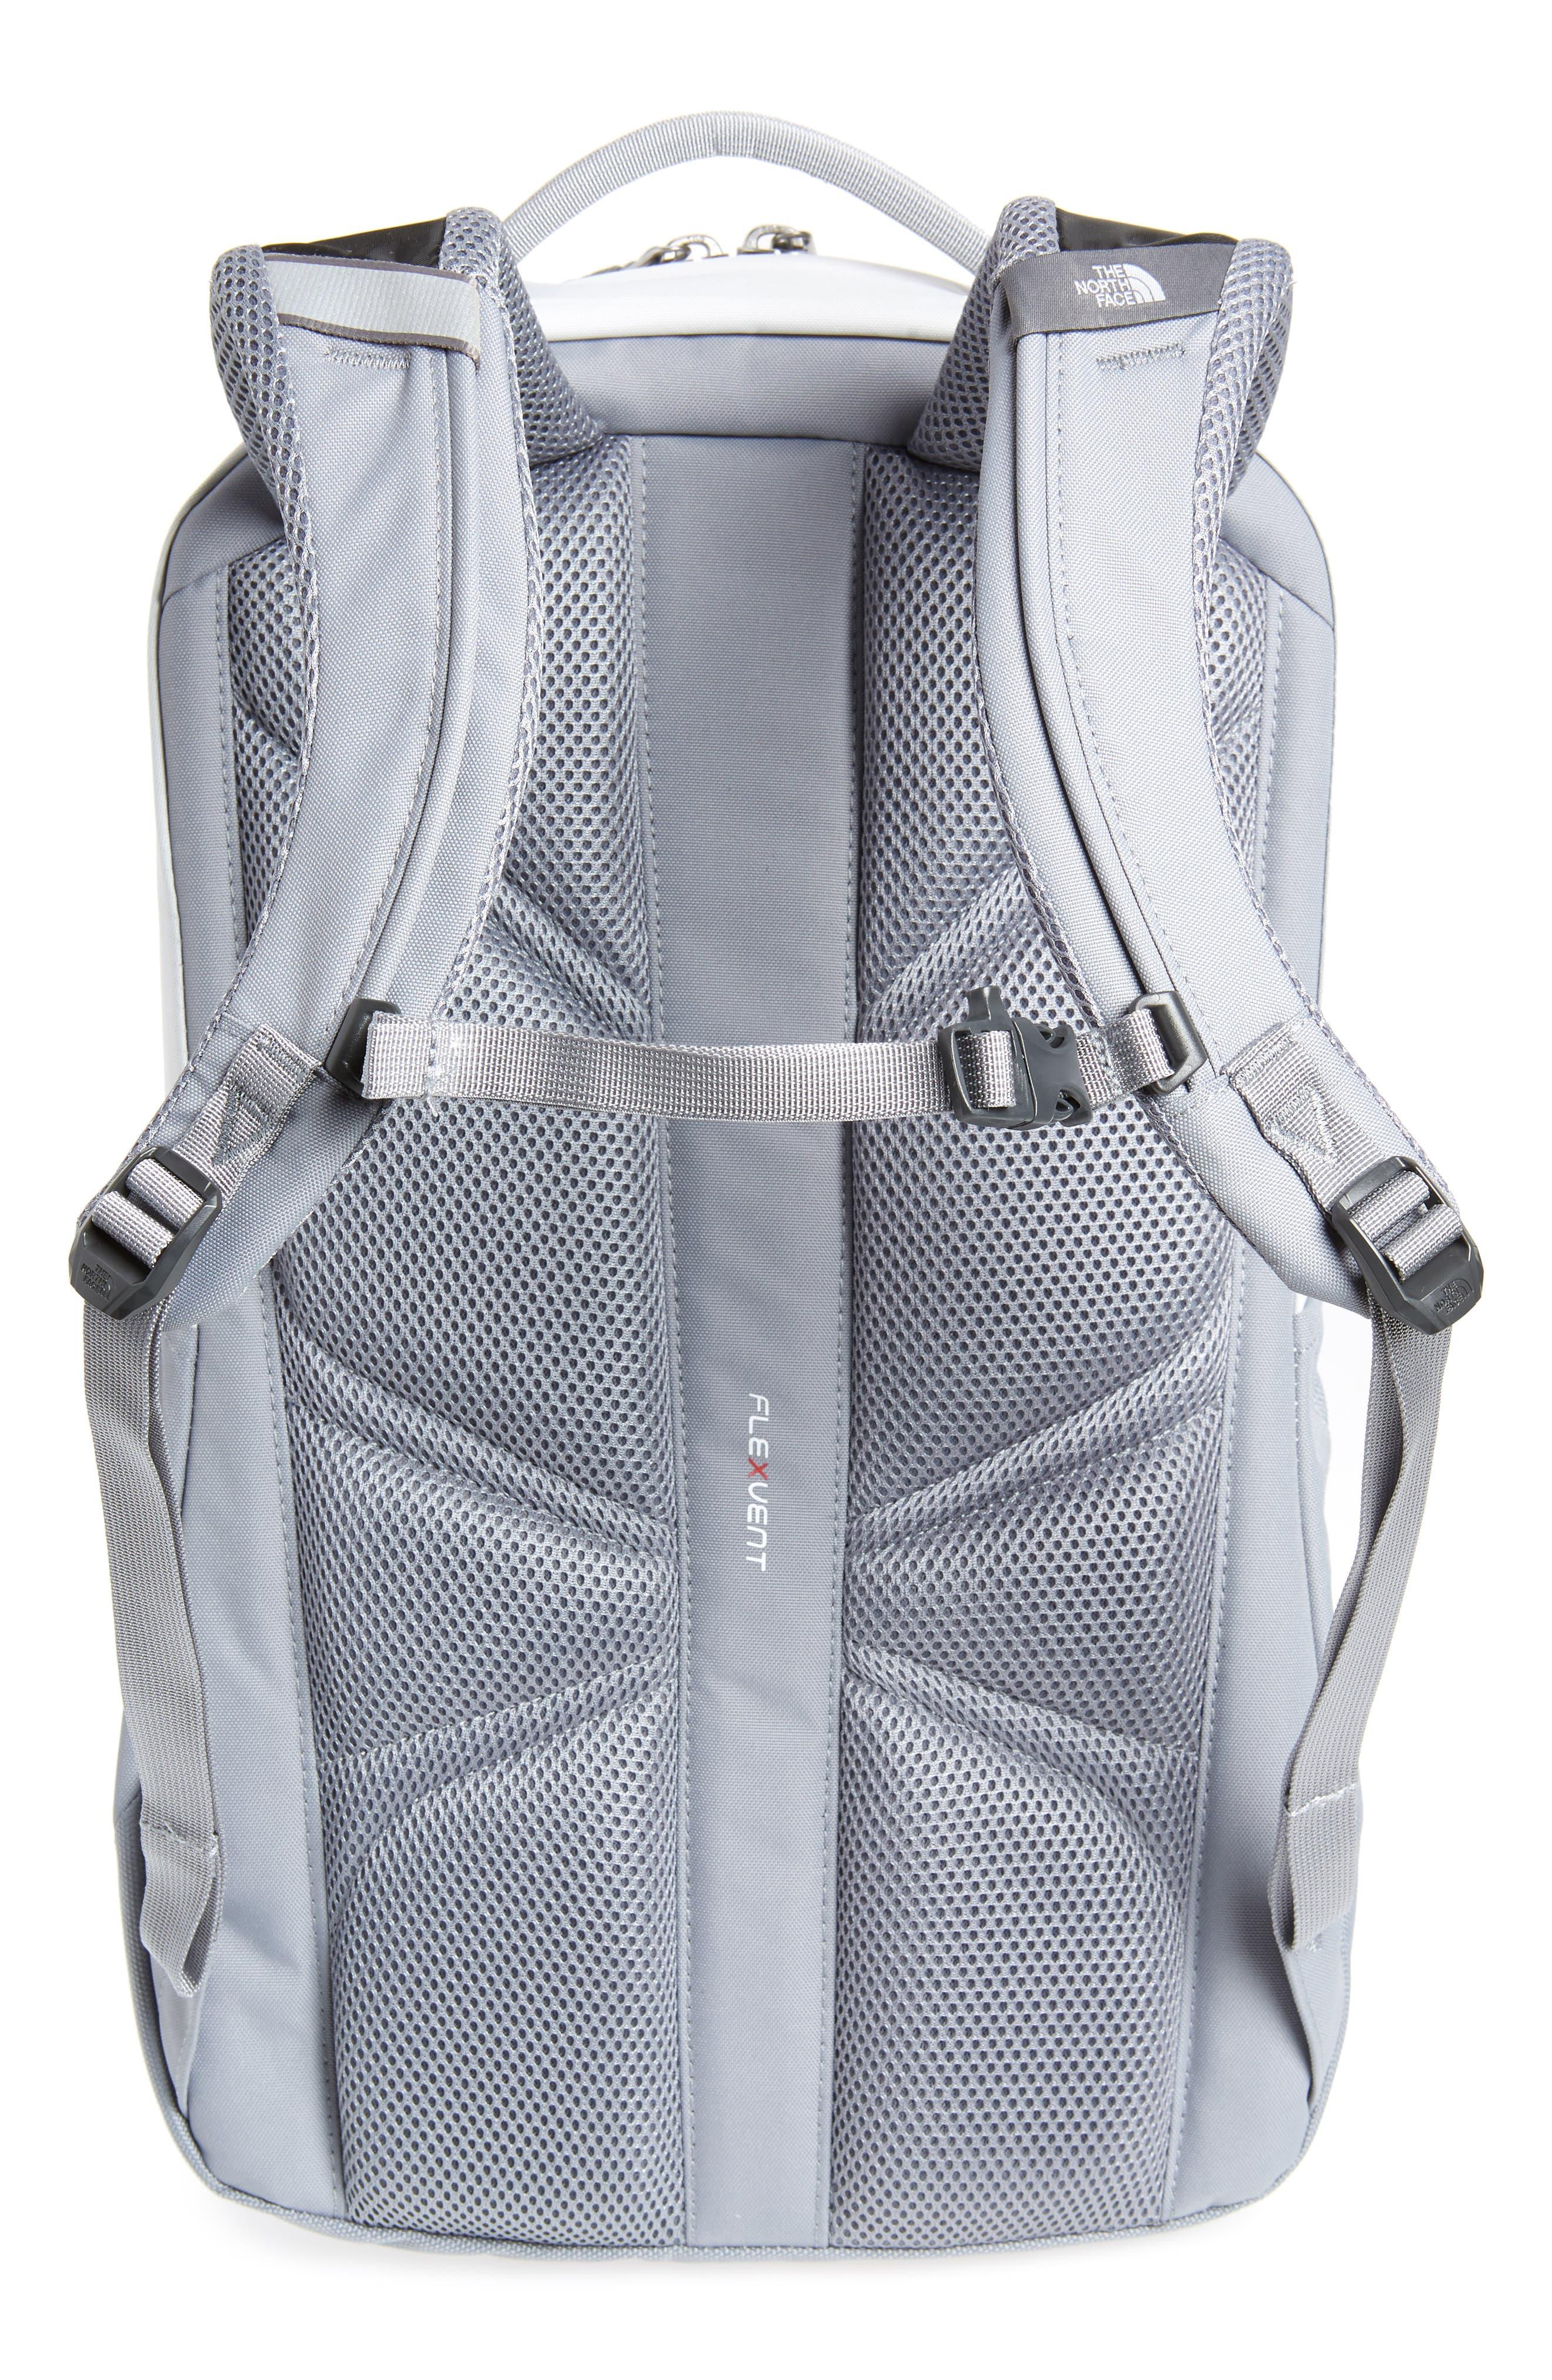 Vault Backpack,                             Alternate thumbnail 2, color,                             030